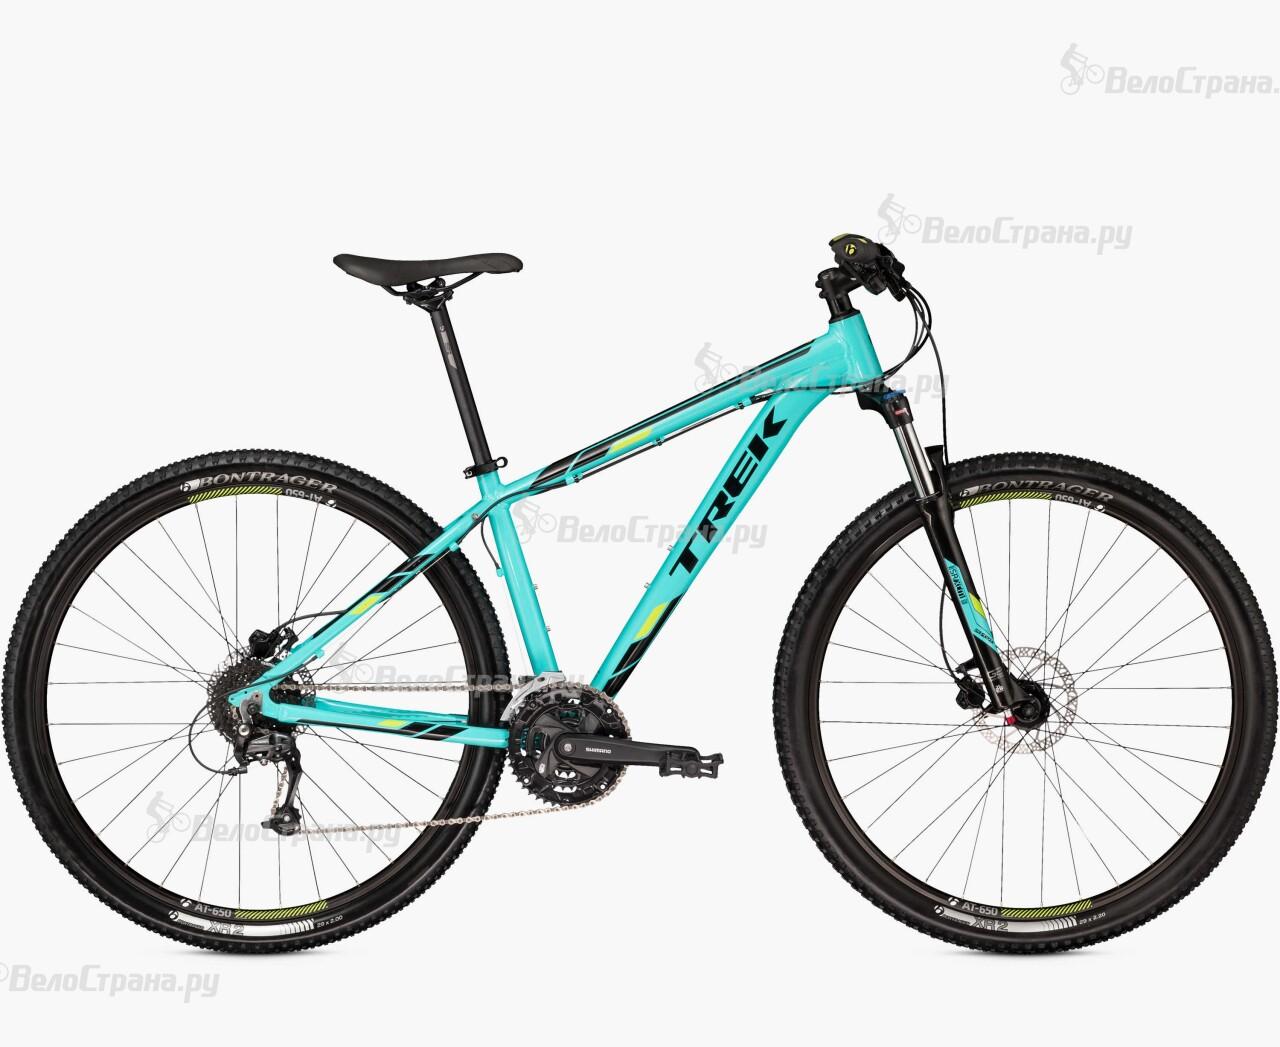 Велосипед Trek Marlin 7 27,5 (2016) велосипед trek marlin 5 29 2016